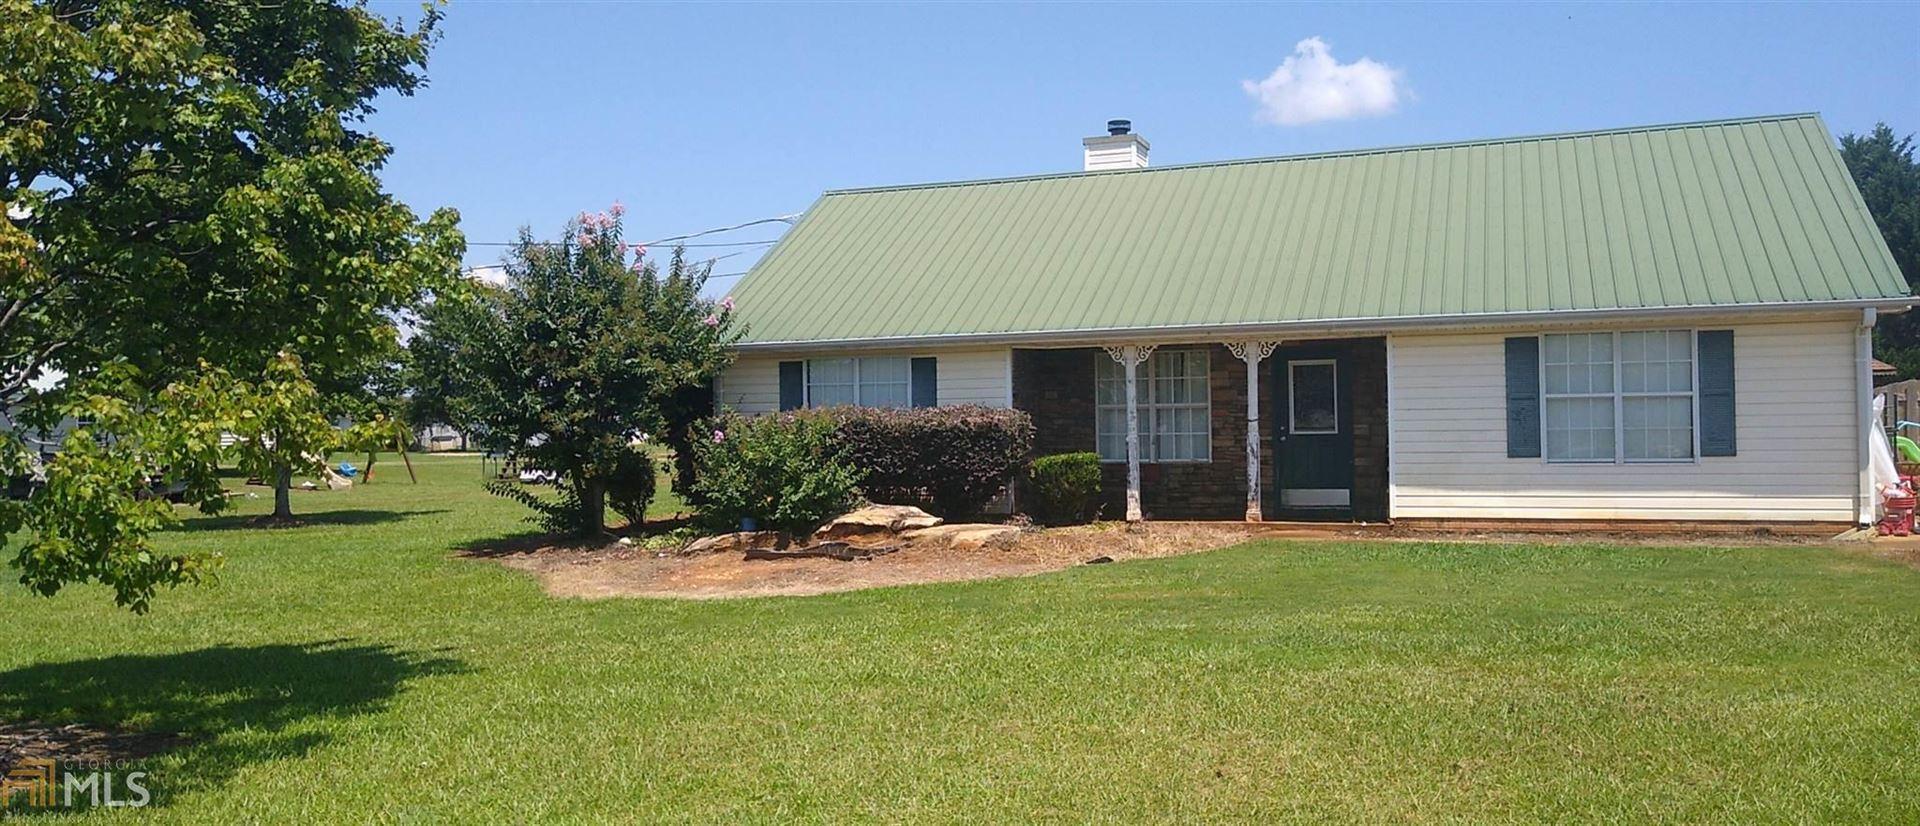 621 Garland, Locust Grove, GA 30248 - #: 8844802